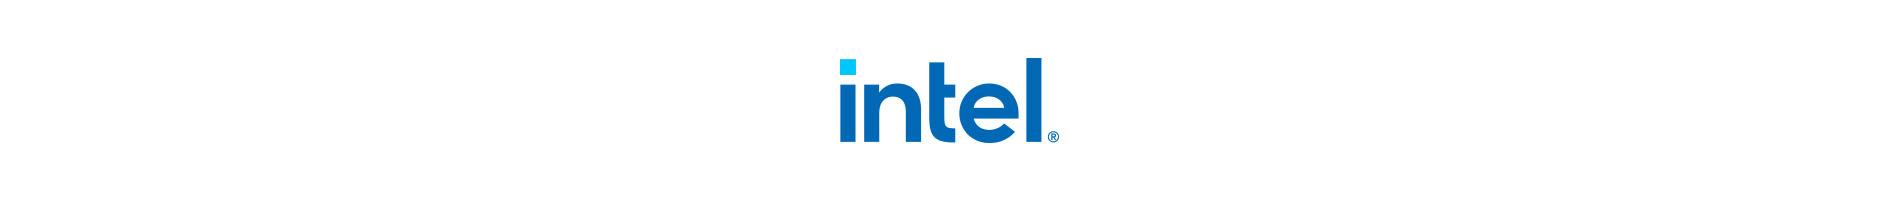 Intel Antonline Intel Logo